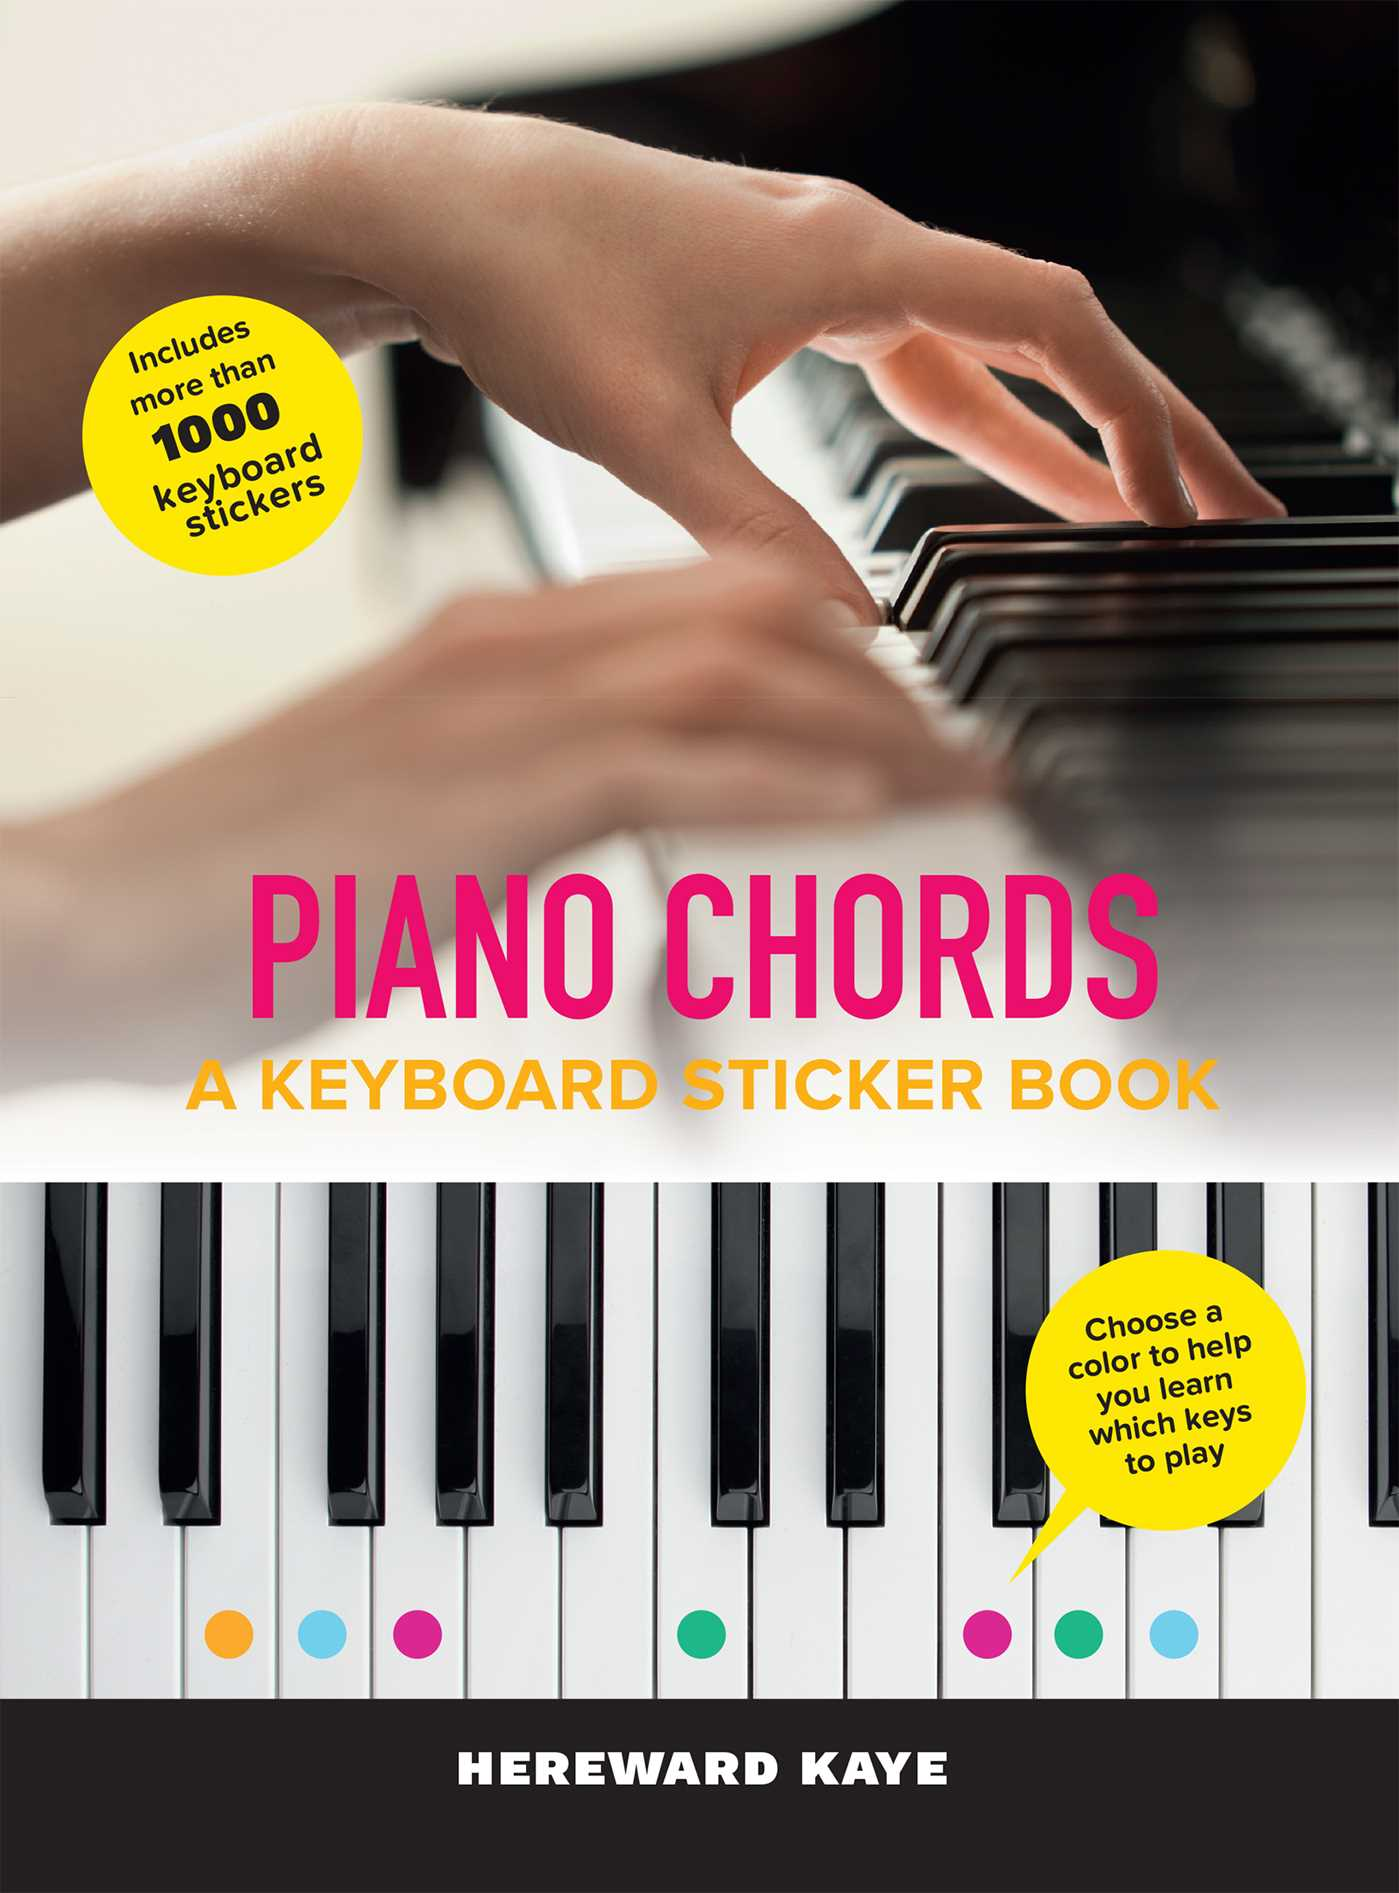 Piano Chords: A Keyboard Sticker Book | Book by Hereward Kaye ...